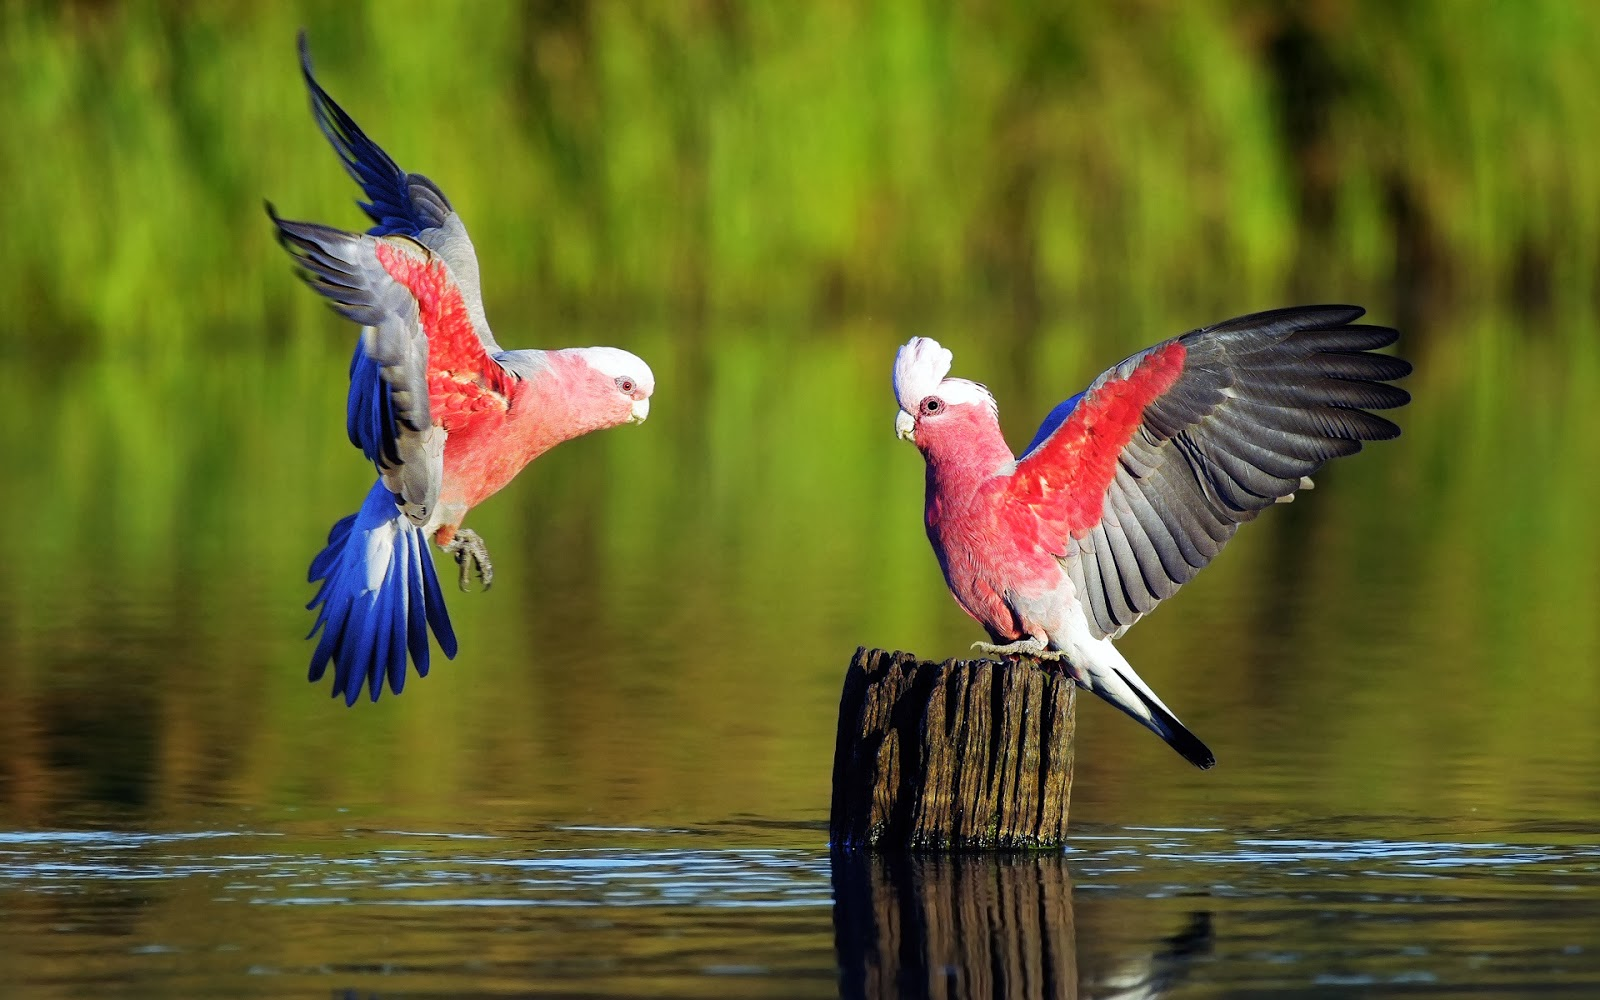 Beautiful Galah Parrot Birds On The Water Hd Wallpaper Most Beautiful Bird In The World Hd 671036 Hd Wallpaper Backgrounds Download